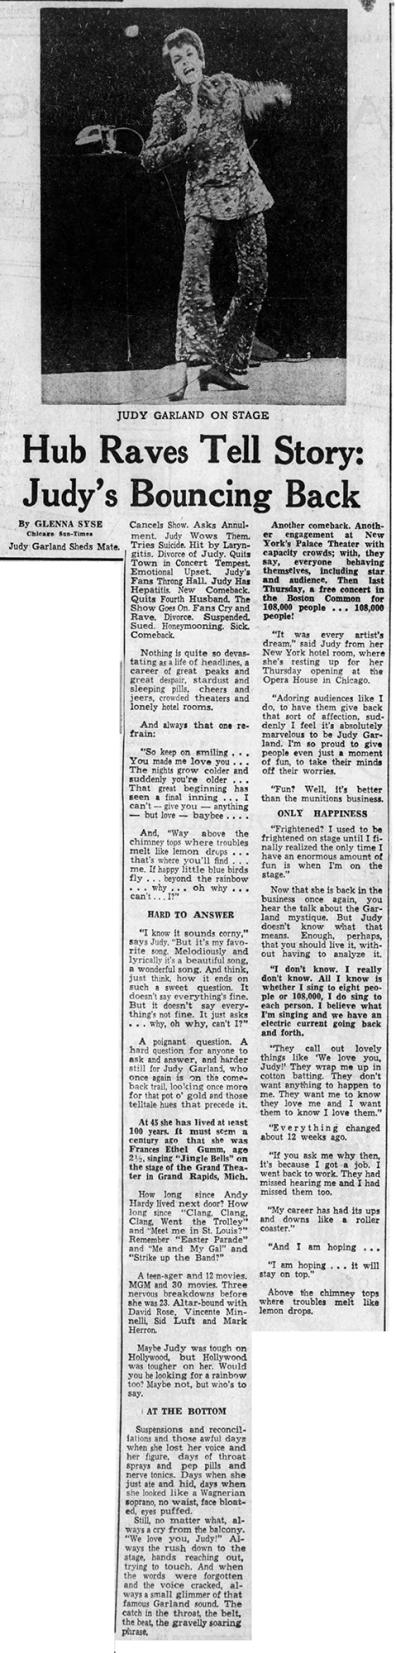 September-10,-1967-JUDY'S-BOUNCING-BACK-The_Boston_Globe